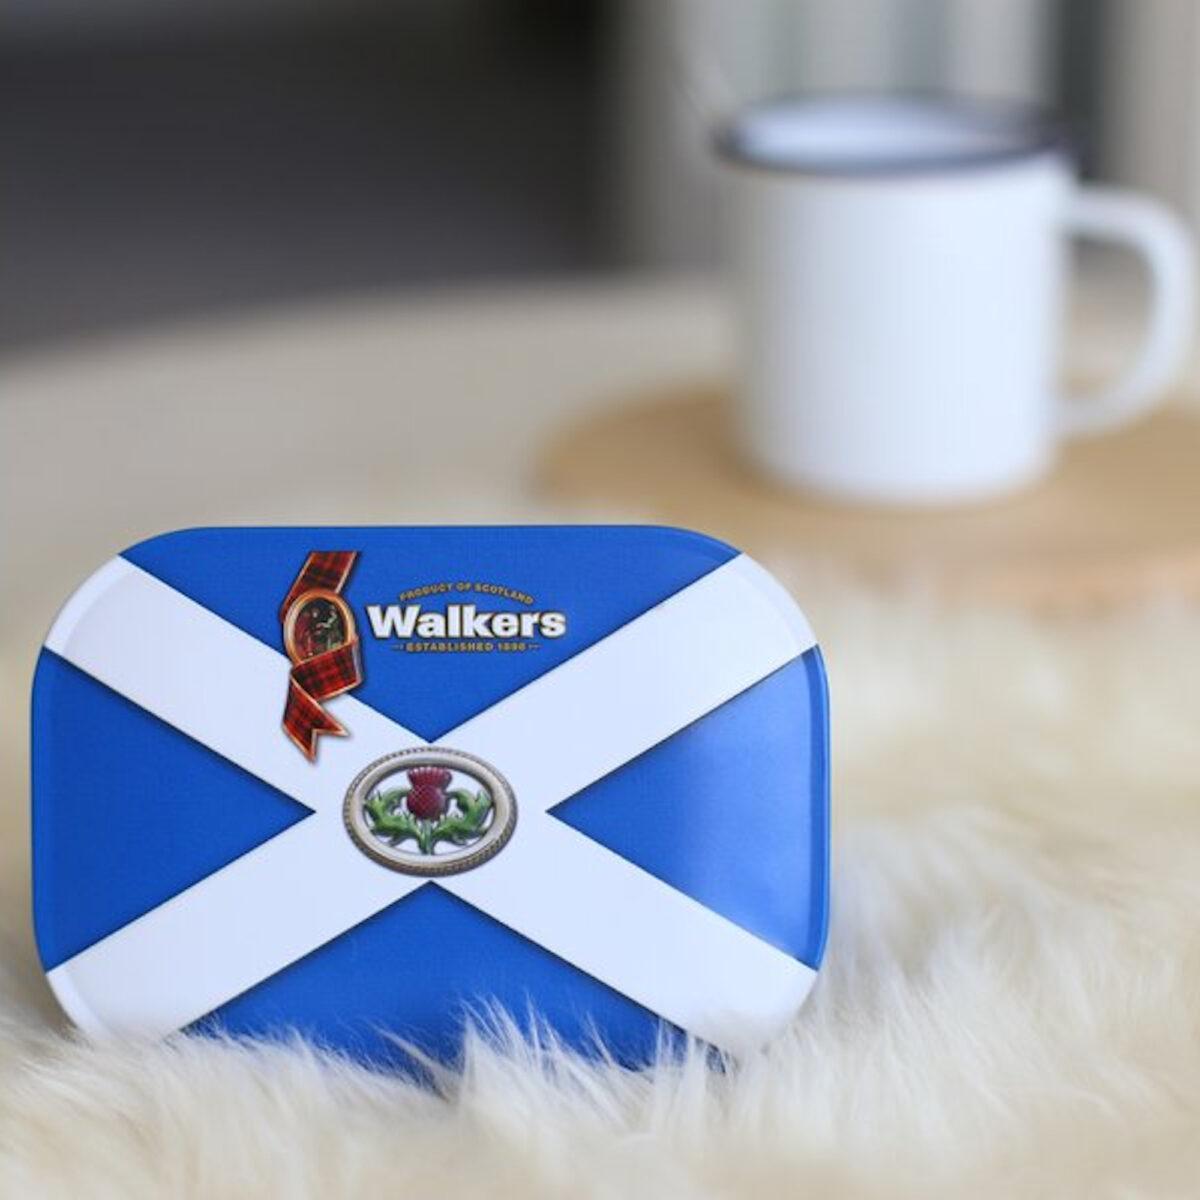 Walkers Shortbread Saltire Keepsake Tin